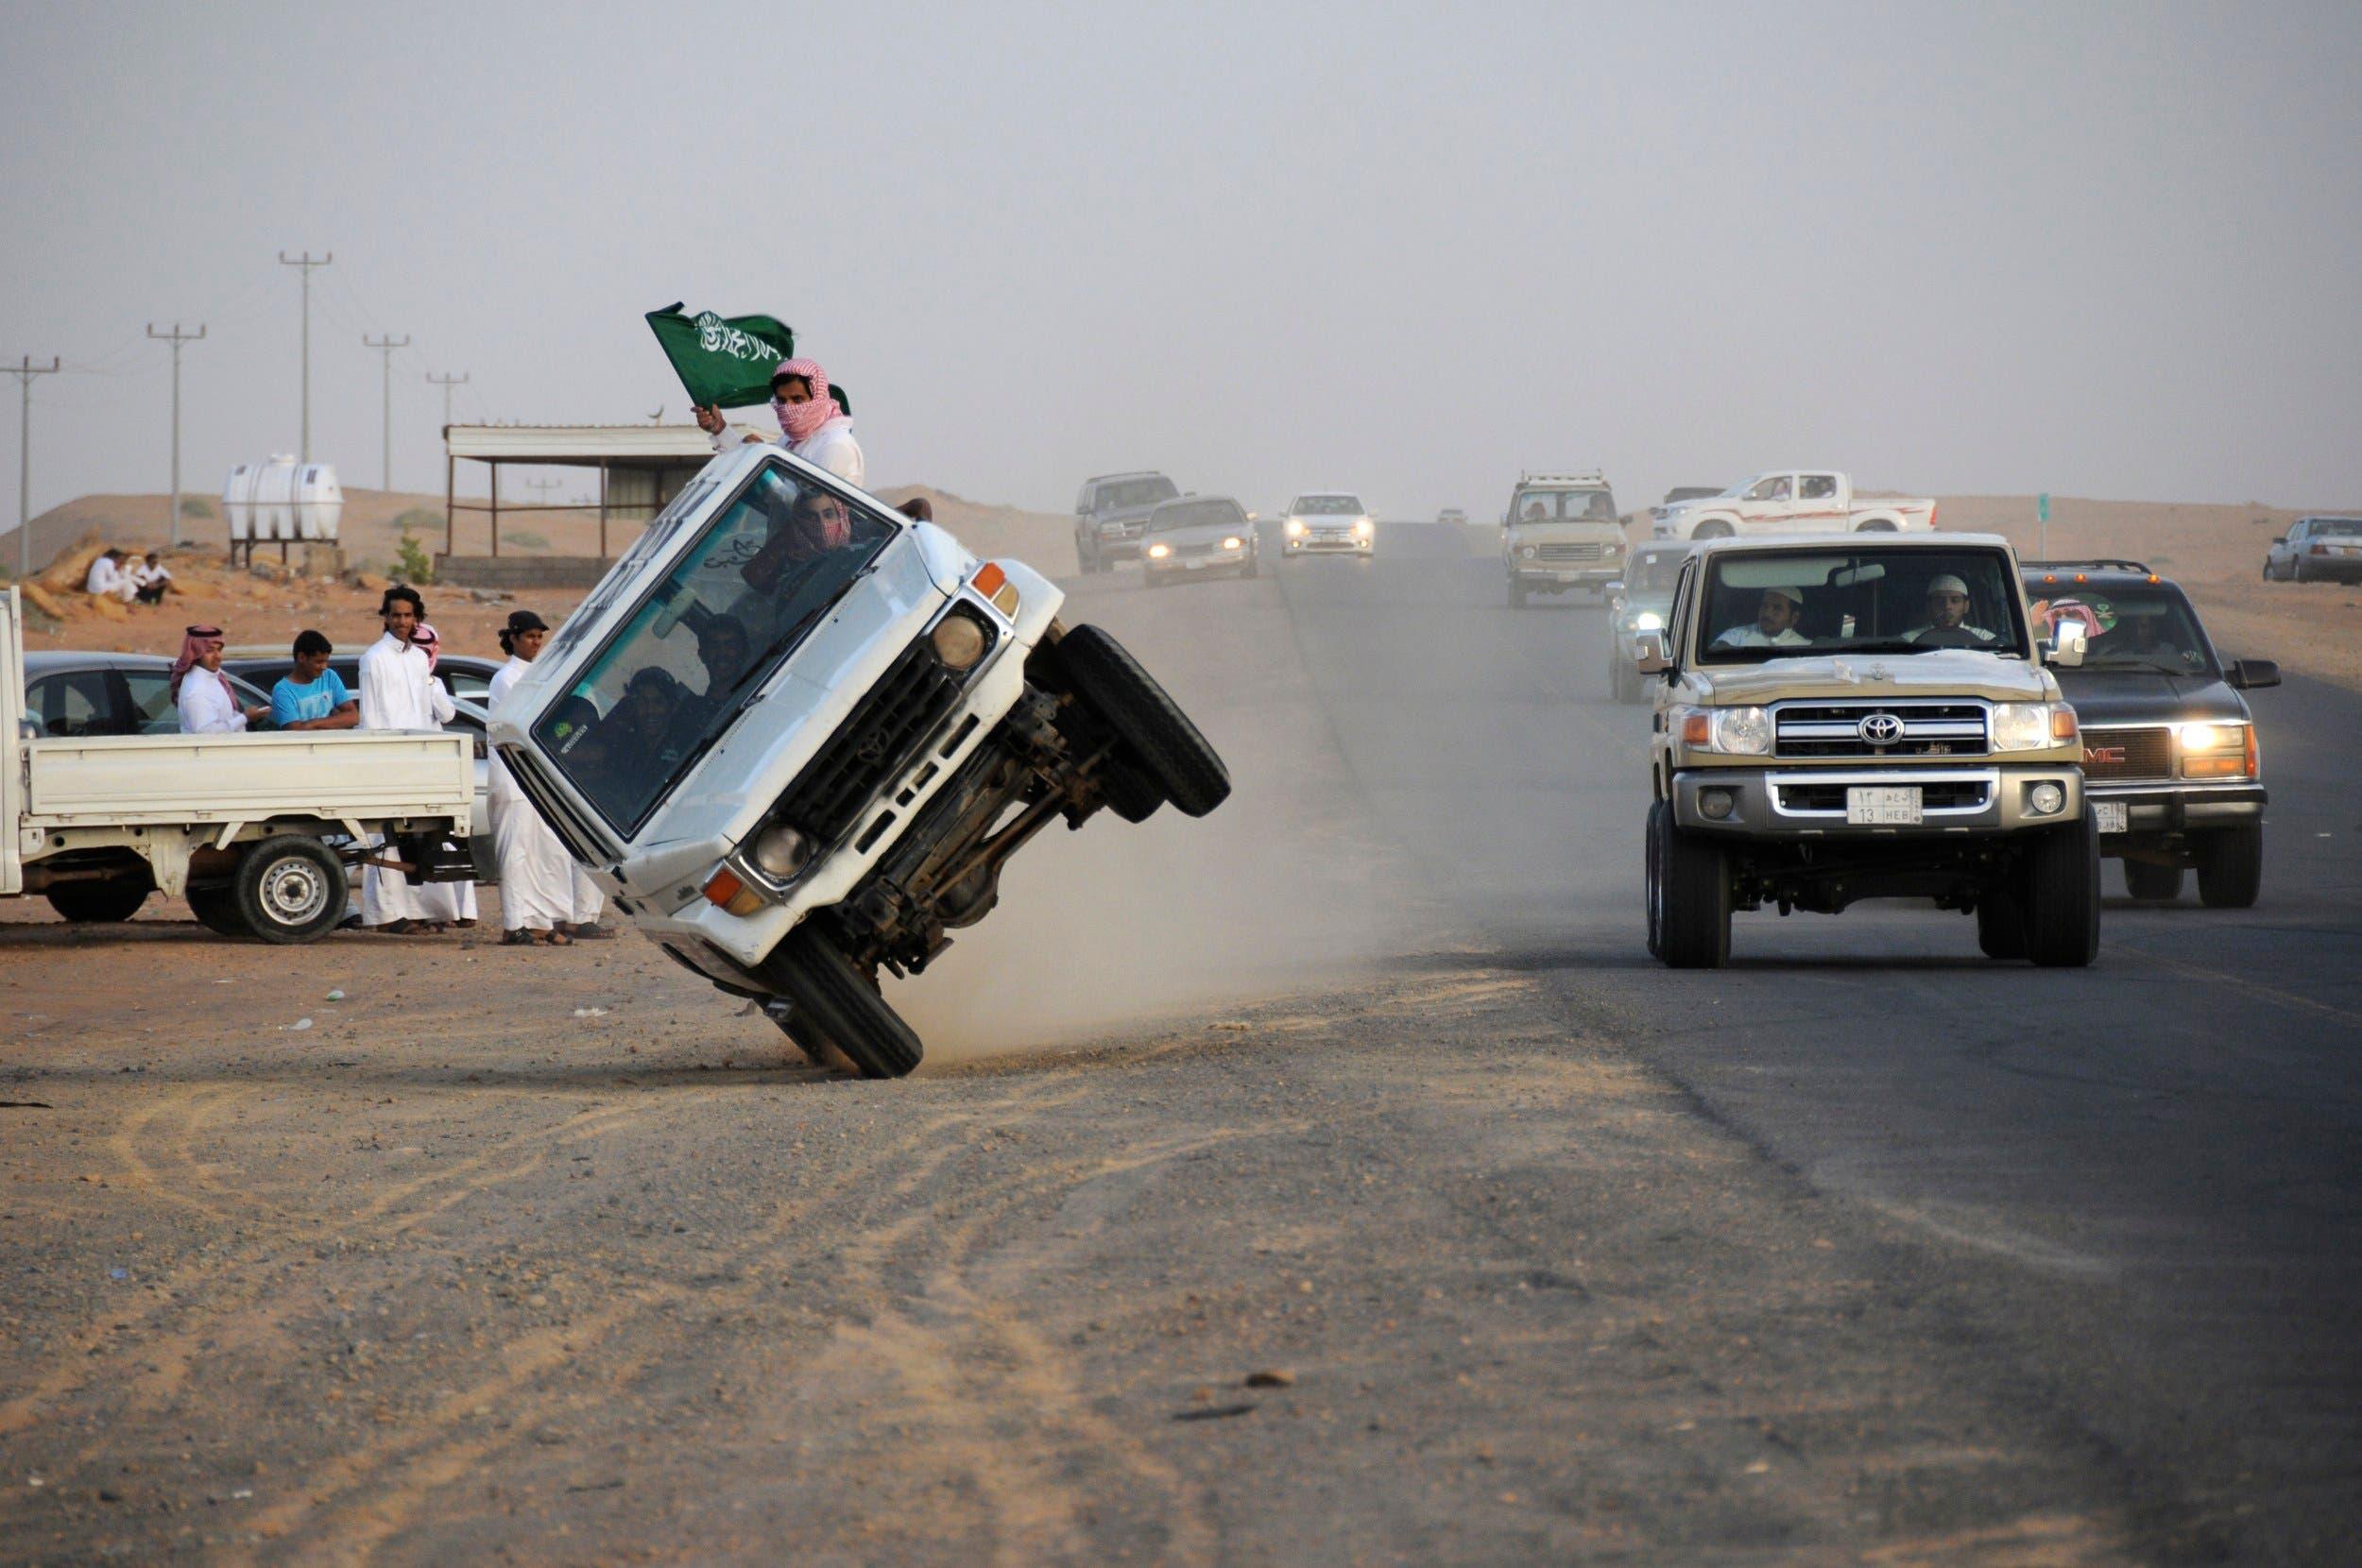 Saudis celebrate National Day